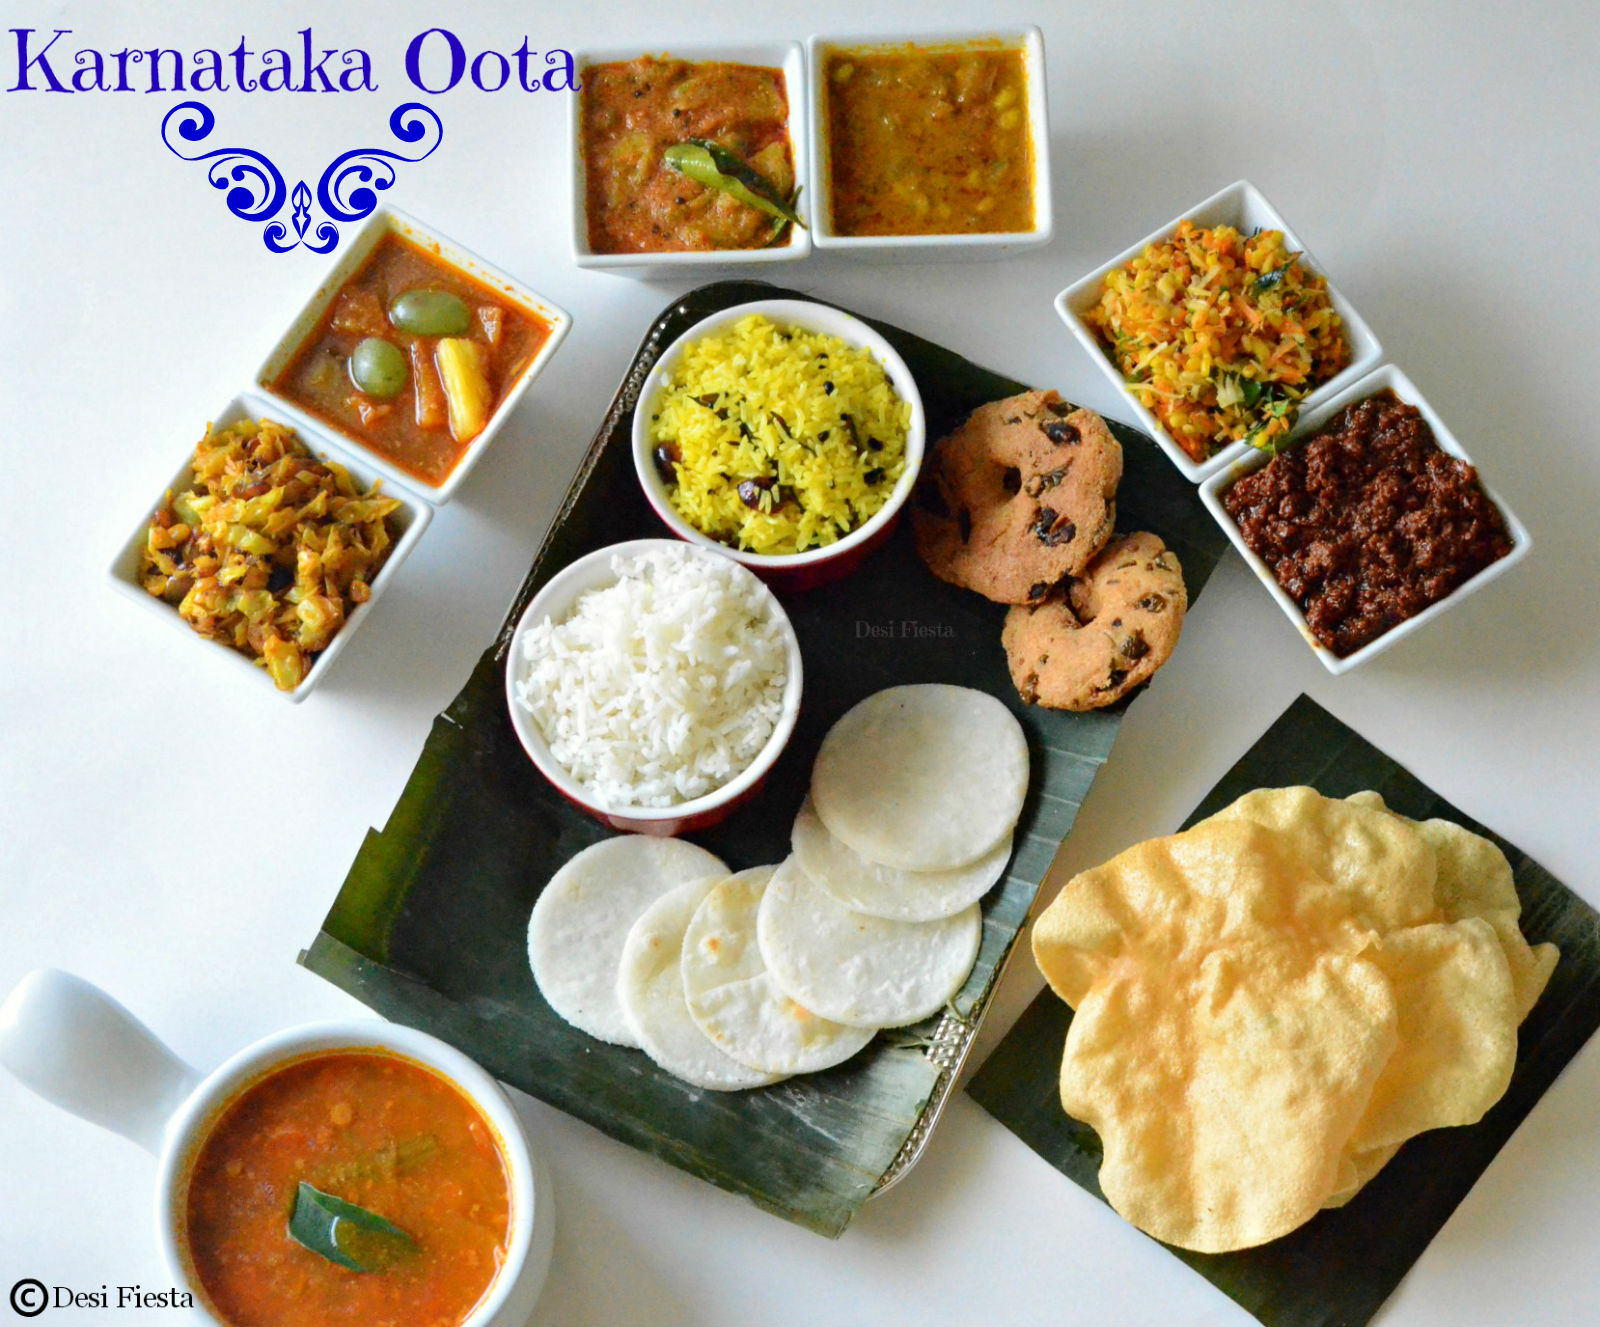 Karnataka oota kannadiga oota kannada thali by desi fiesta foodblogs forumfinder Image collections